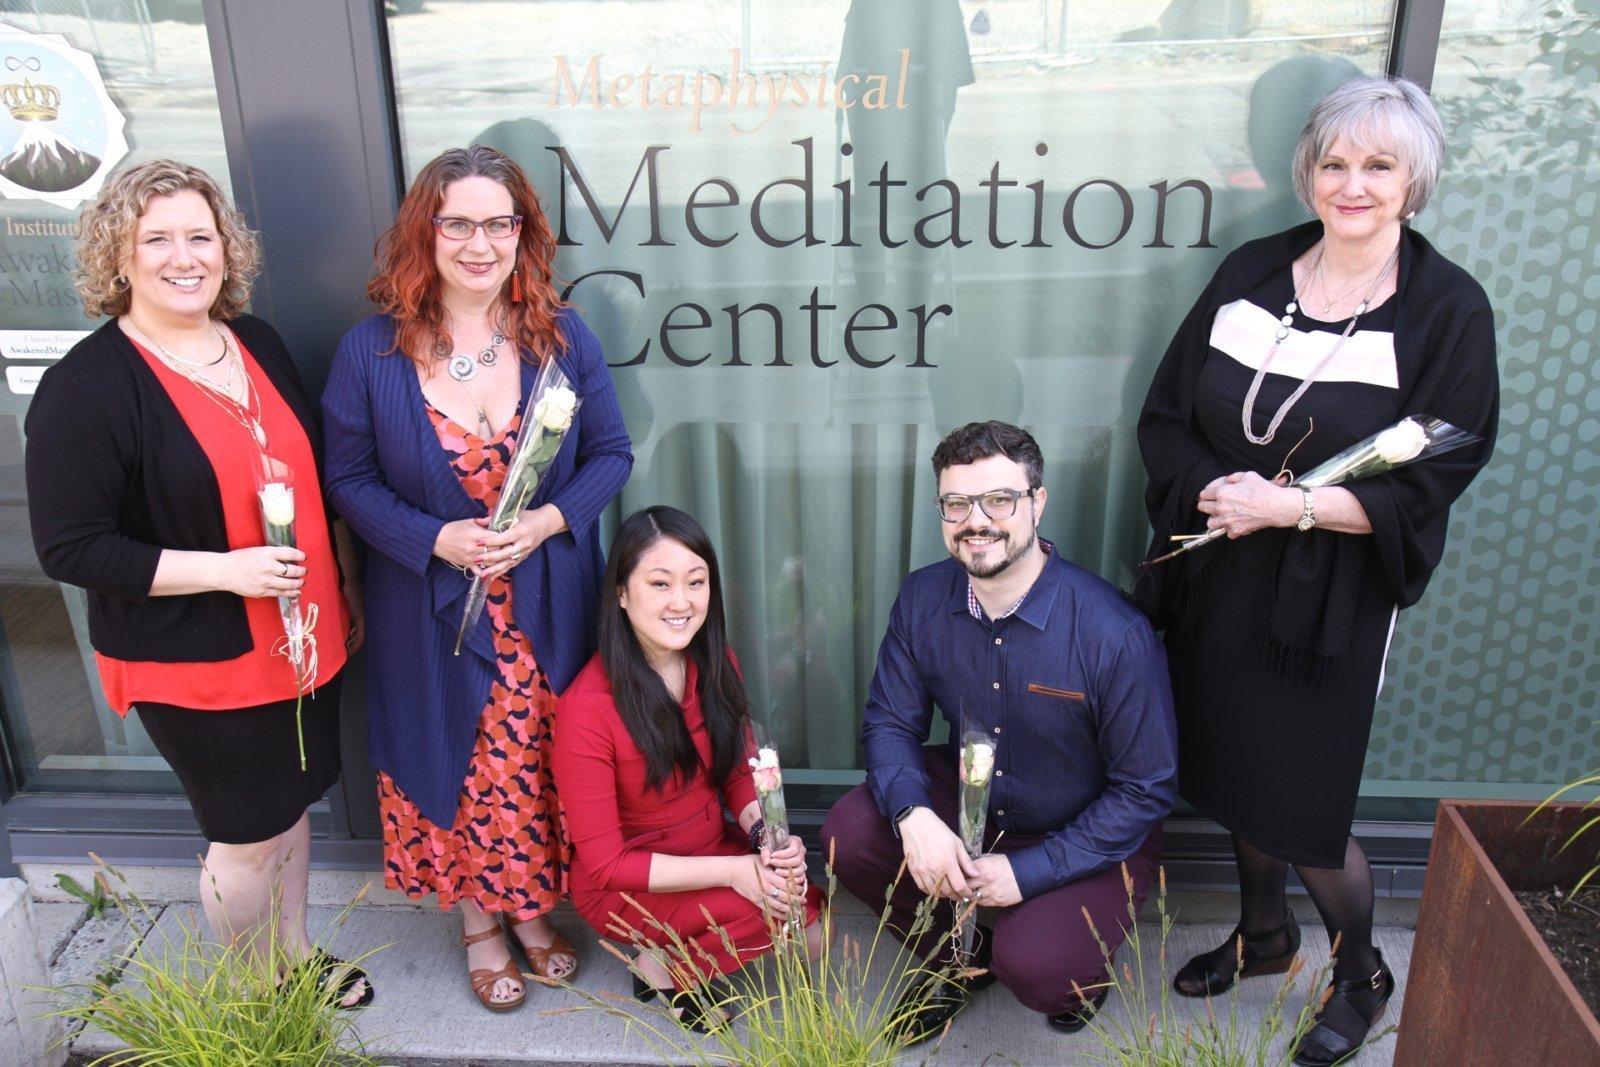 Institute of Awakened Mastery - Metaphysical Meditation Center in Seattle